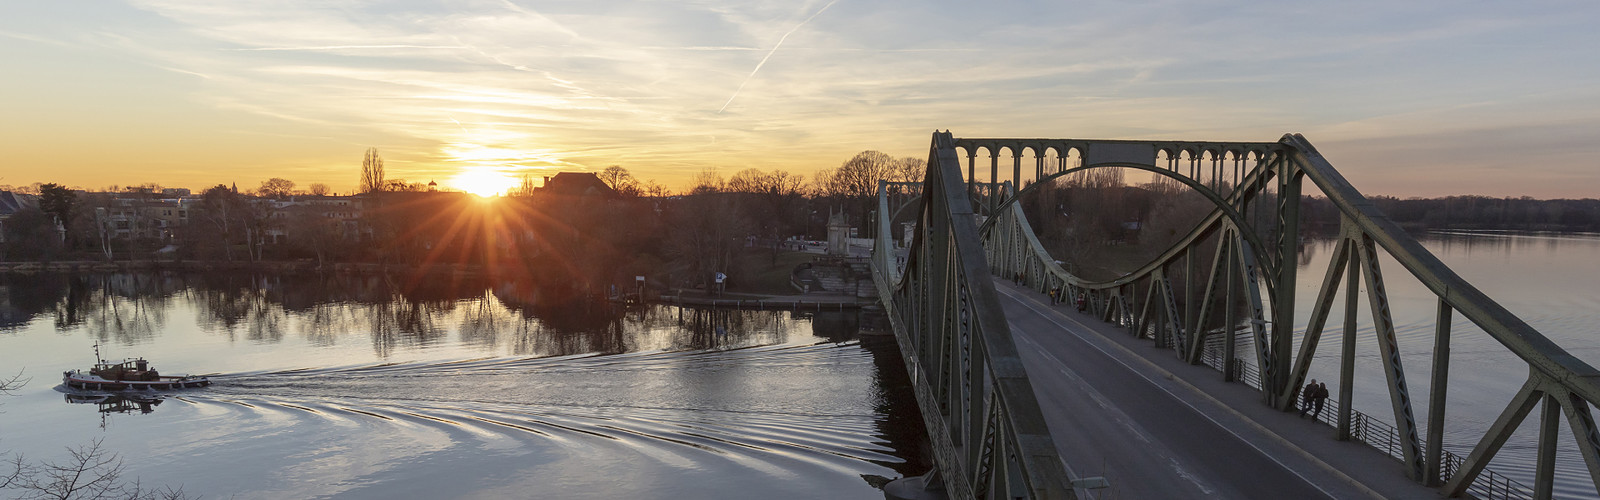 Sonnenuntergang Glienicker Brücke , Foto: André Stiebitz , Lizenz: PMSG